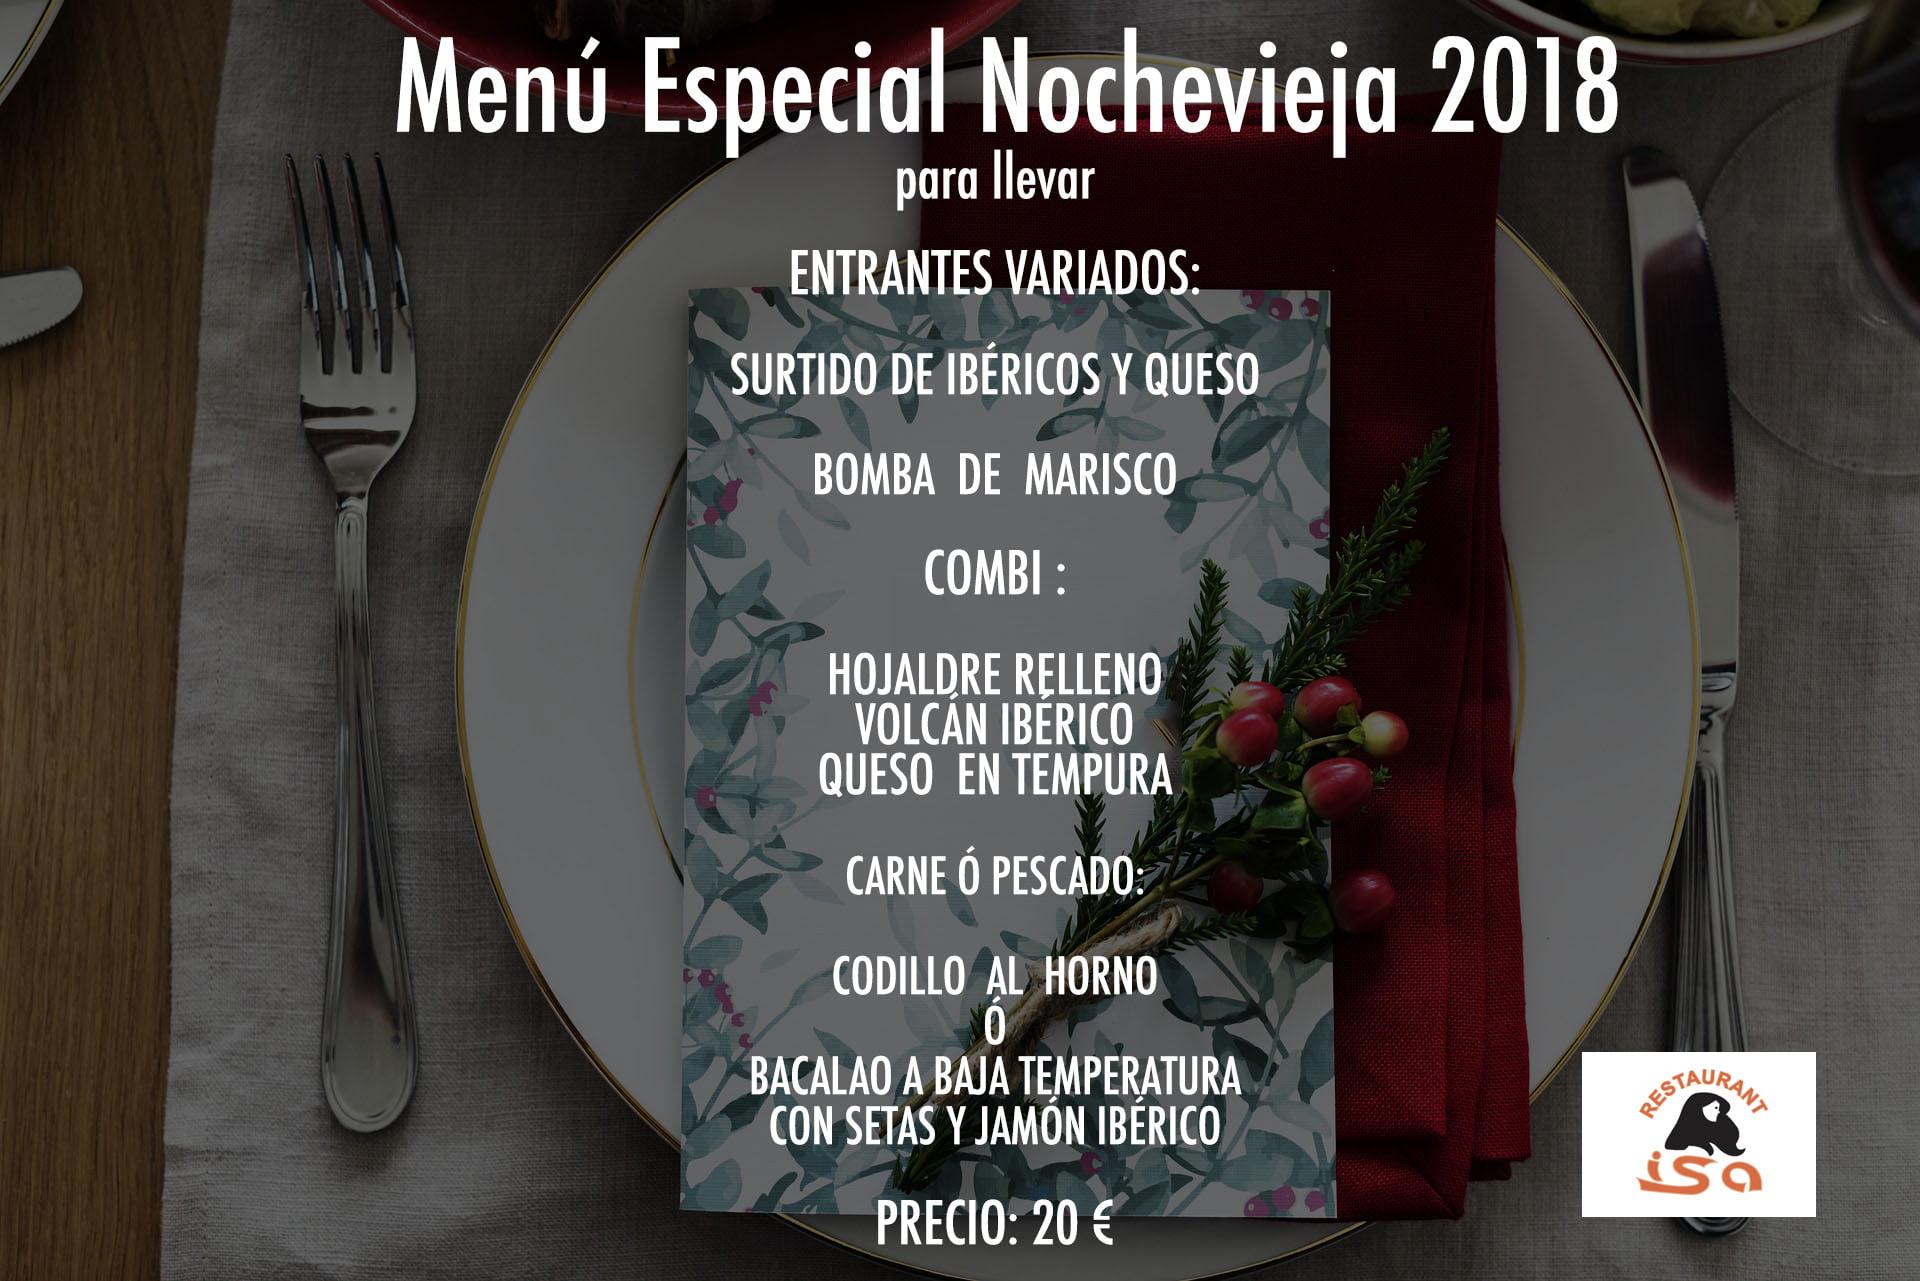 Menú Especial Nochevieja para llevar Restaurante Isa